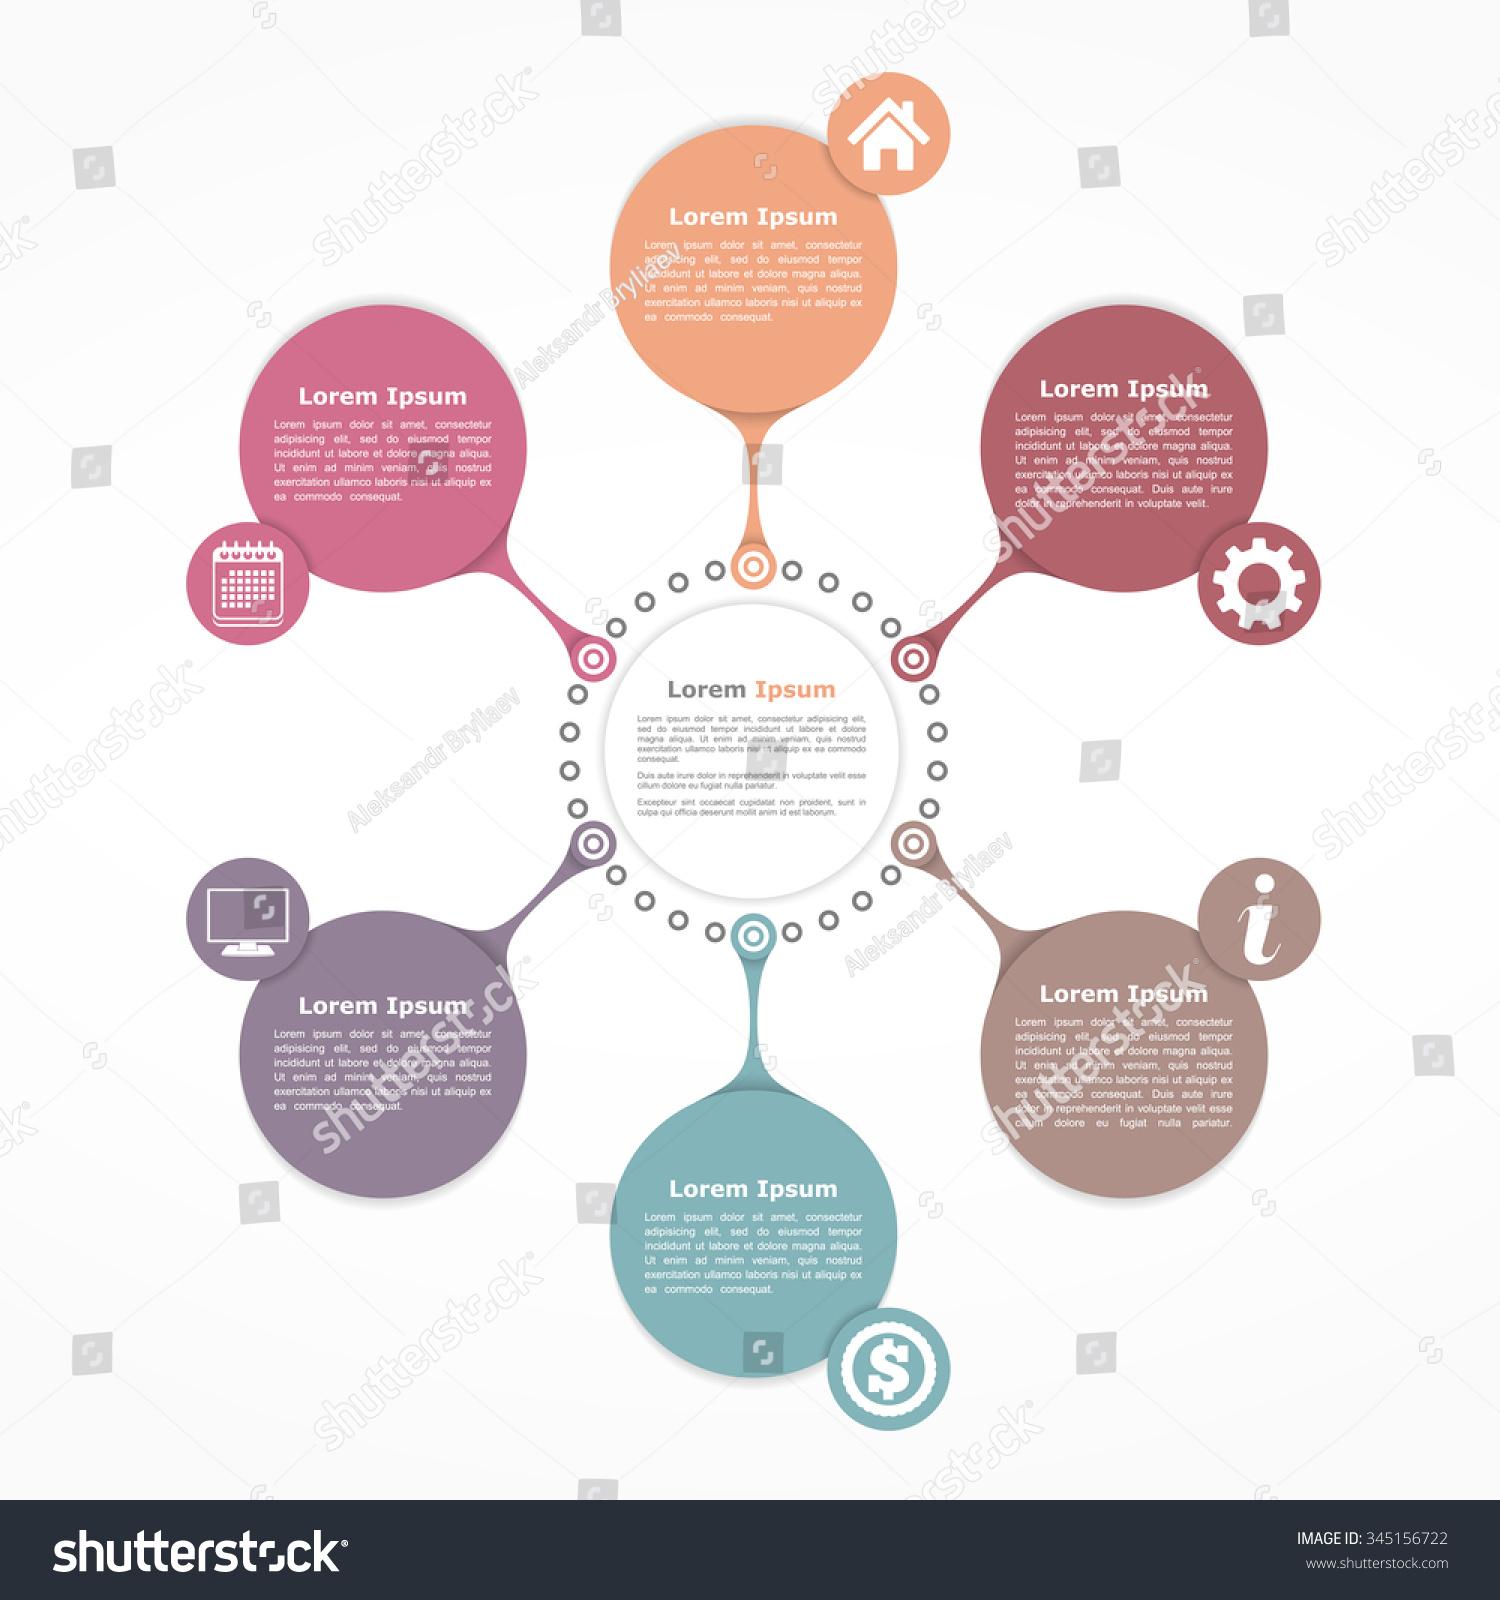 Vetor stock de circle flow diagram template six elements livre de circle flow diagram template with six elements vector eps10 illustration ccuart Gallery